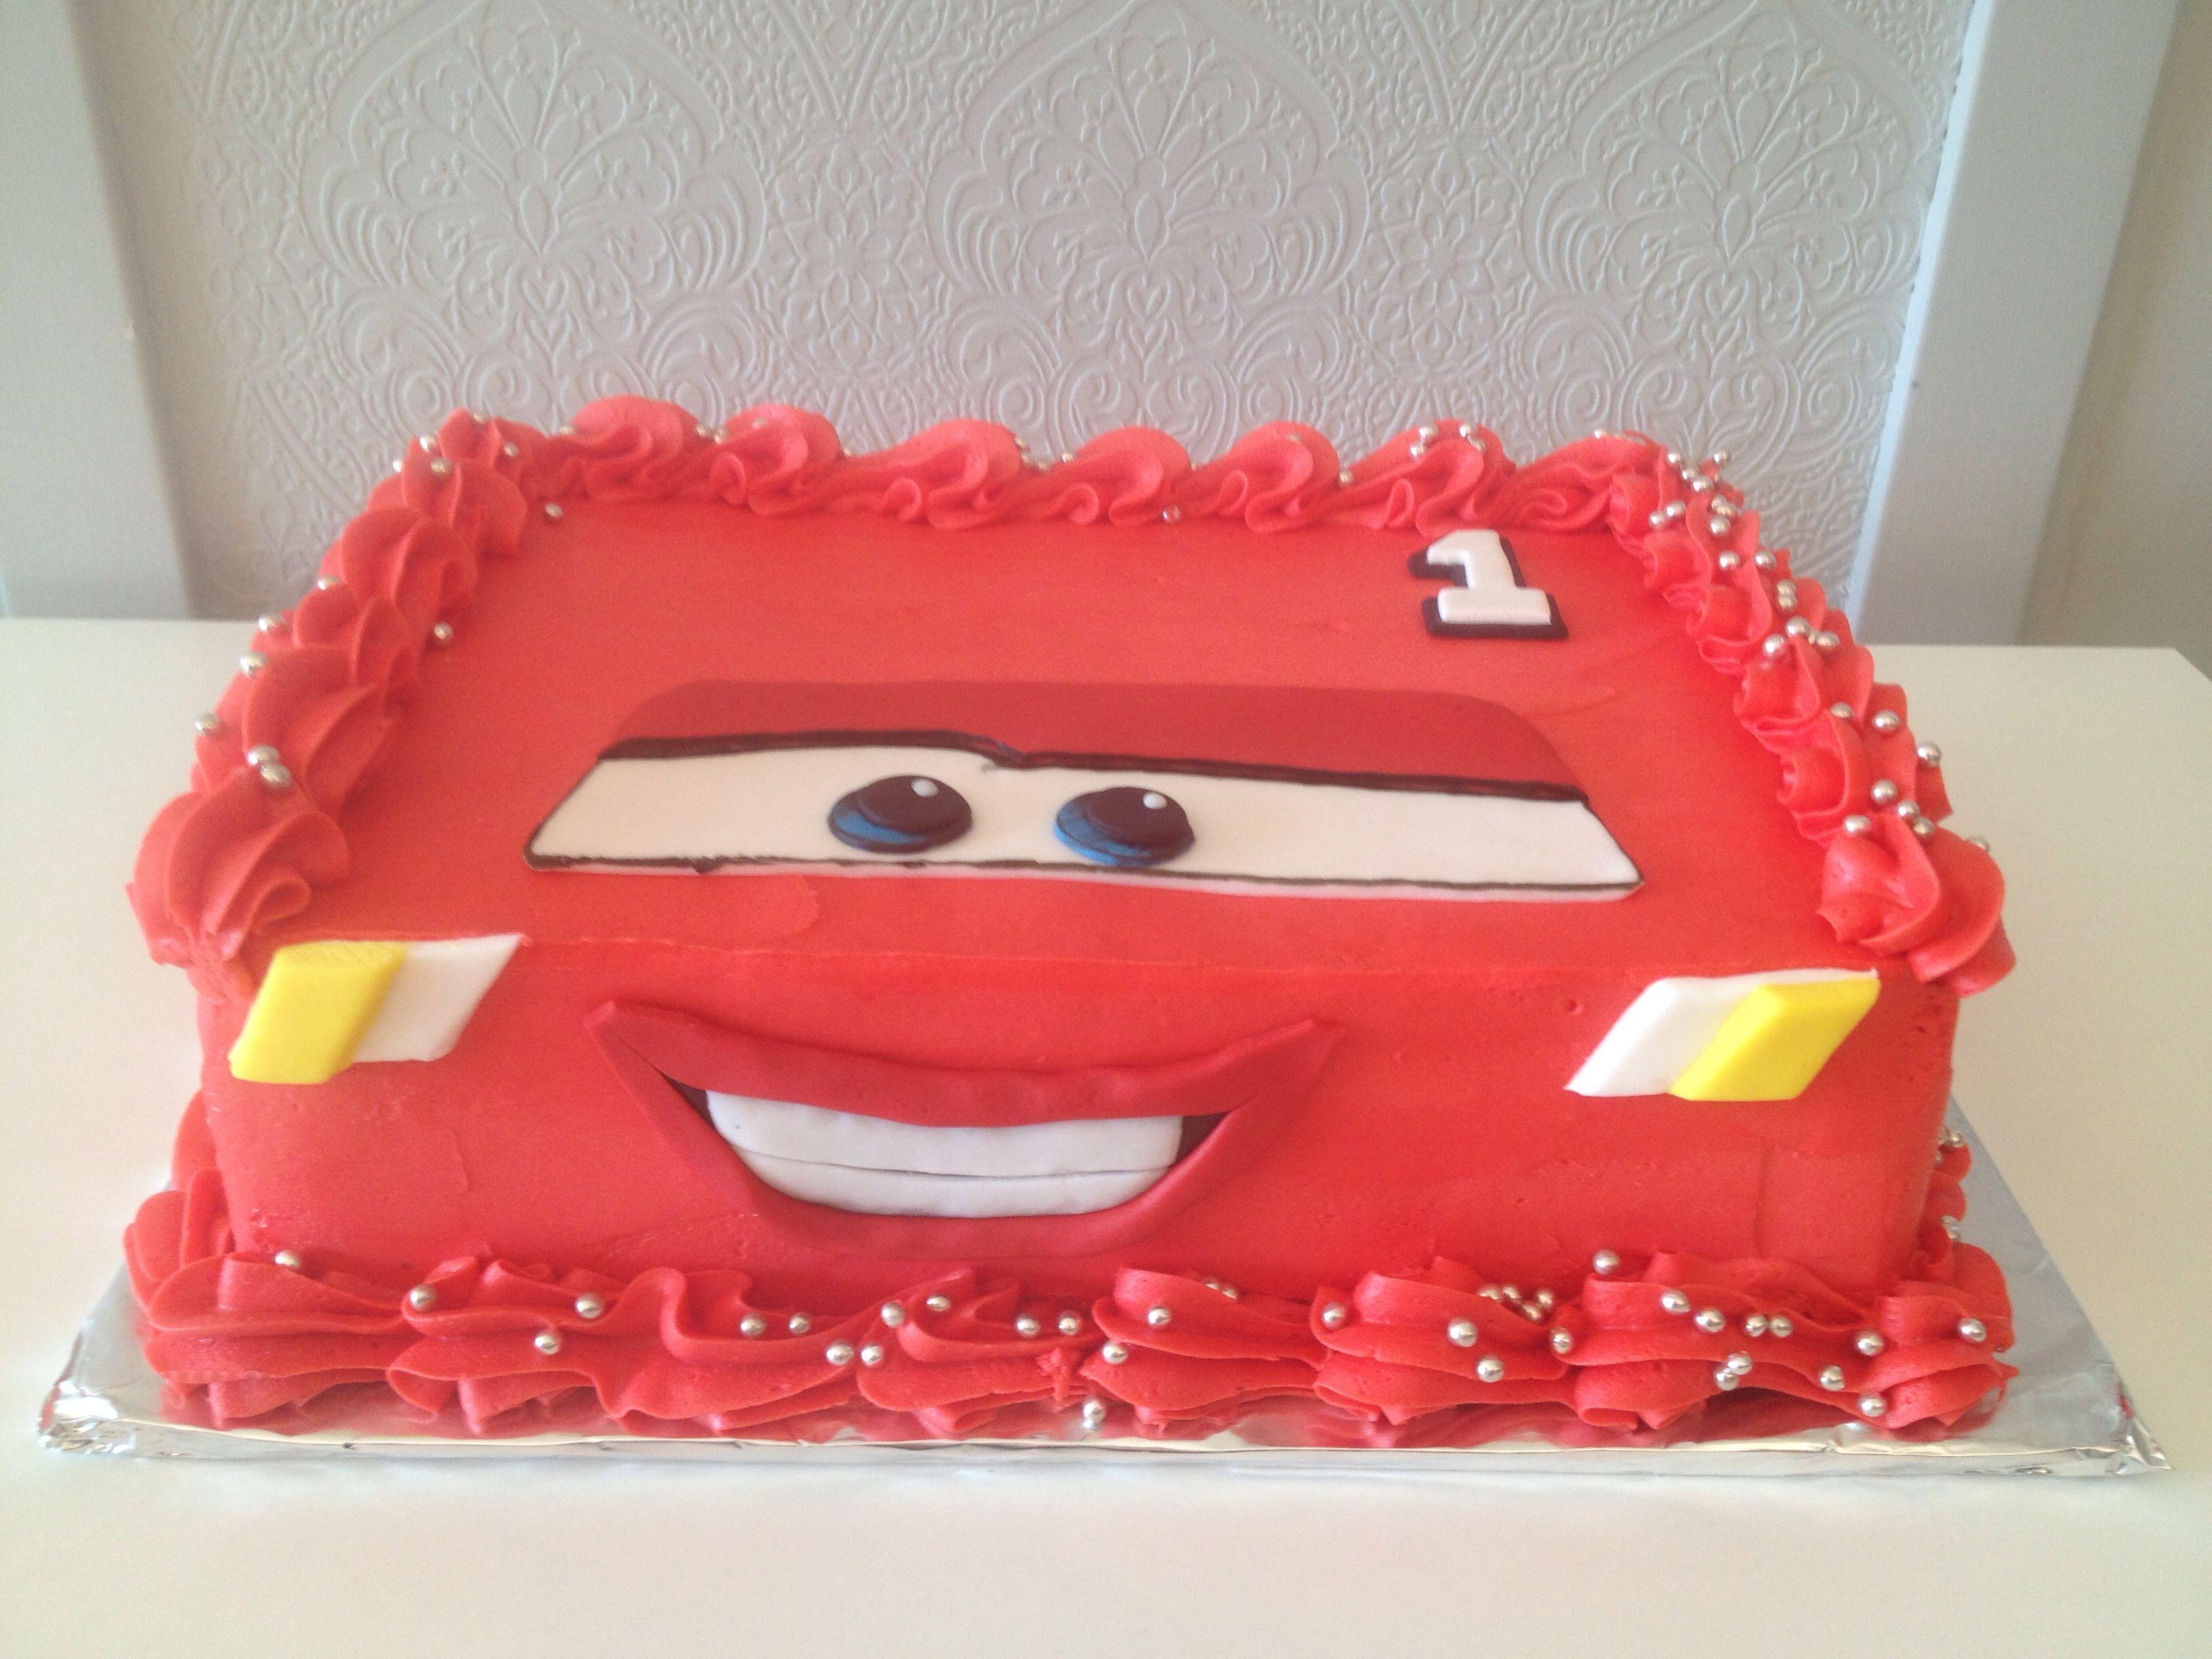 Disney Cars Cake Lightning Mcqueen Red Butter Cream Icing Hand